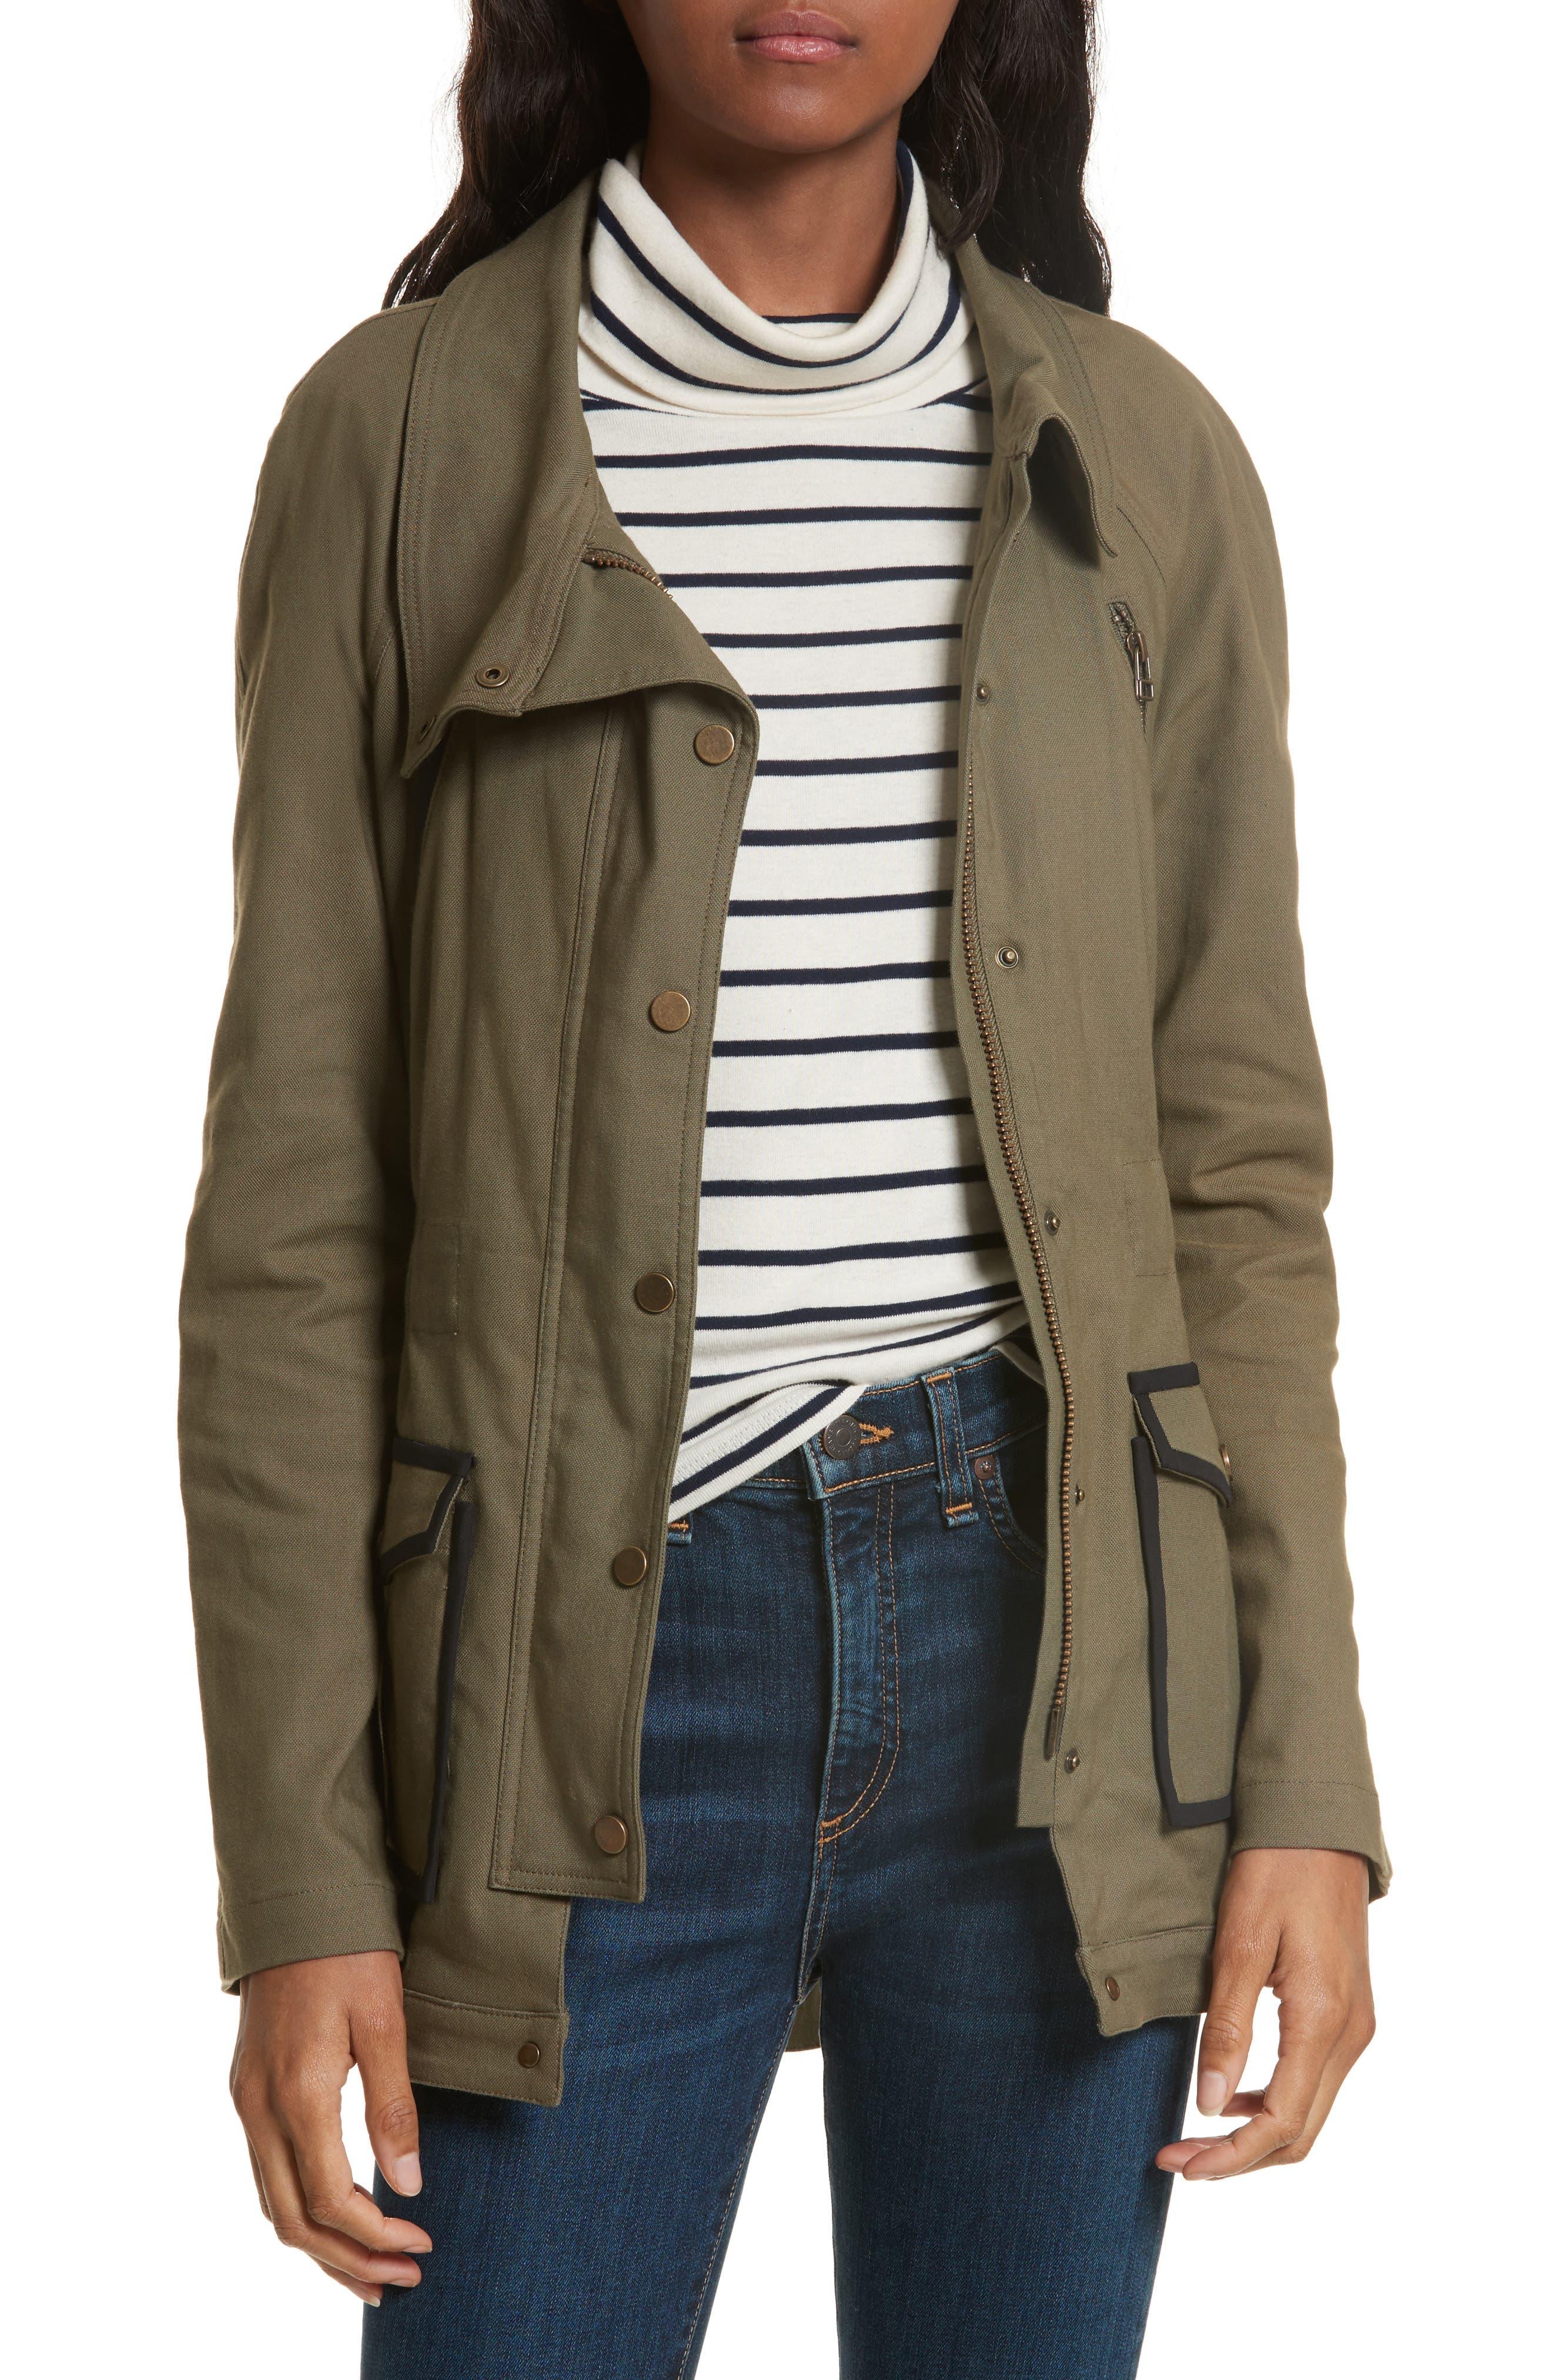 Alternate Image 1 Selected - Veronica Beard Army Jacket